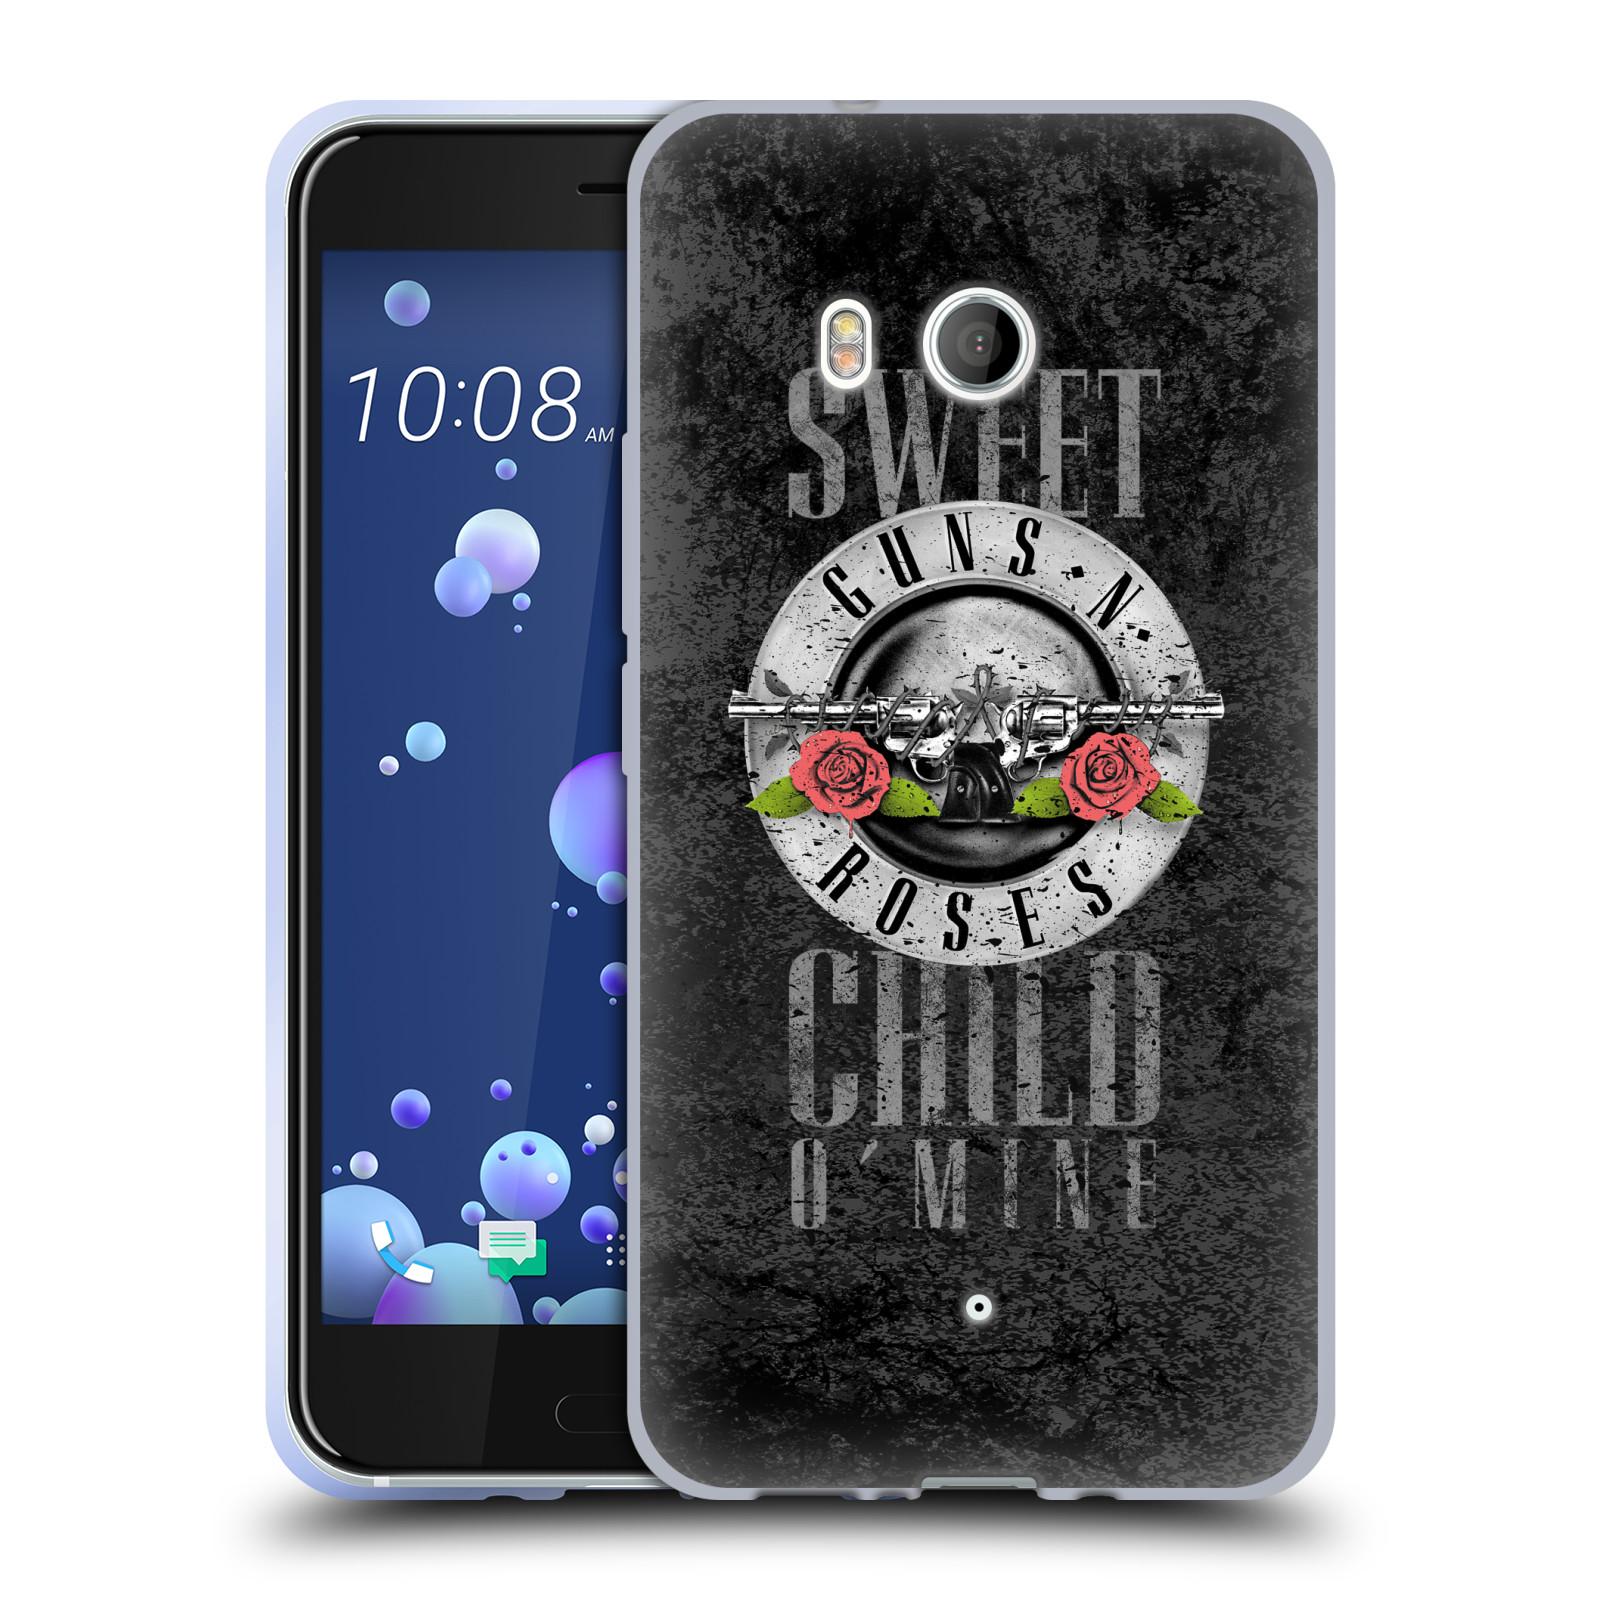 Silikonové pouzdro na mobil HTC U11 - Head Case - Guns N' Roses - Sweet Child